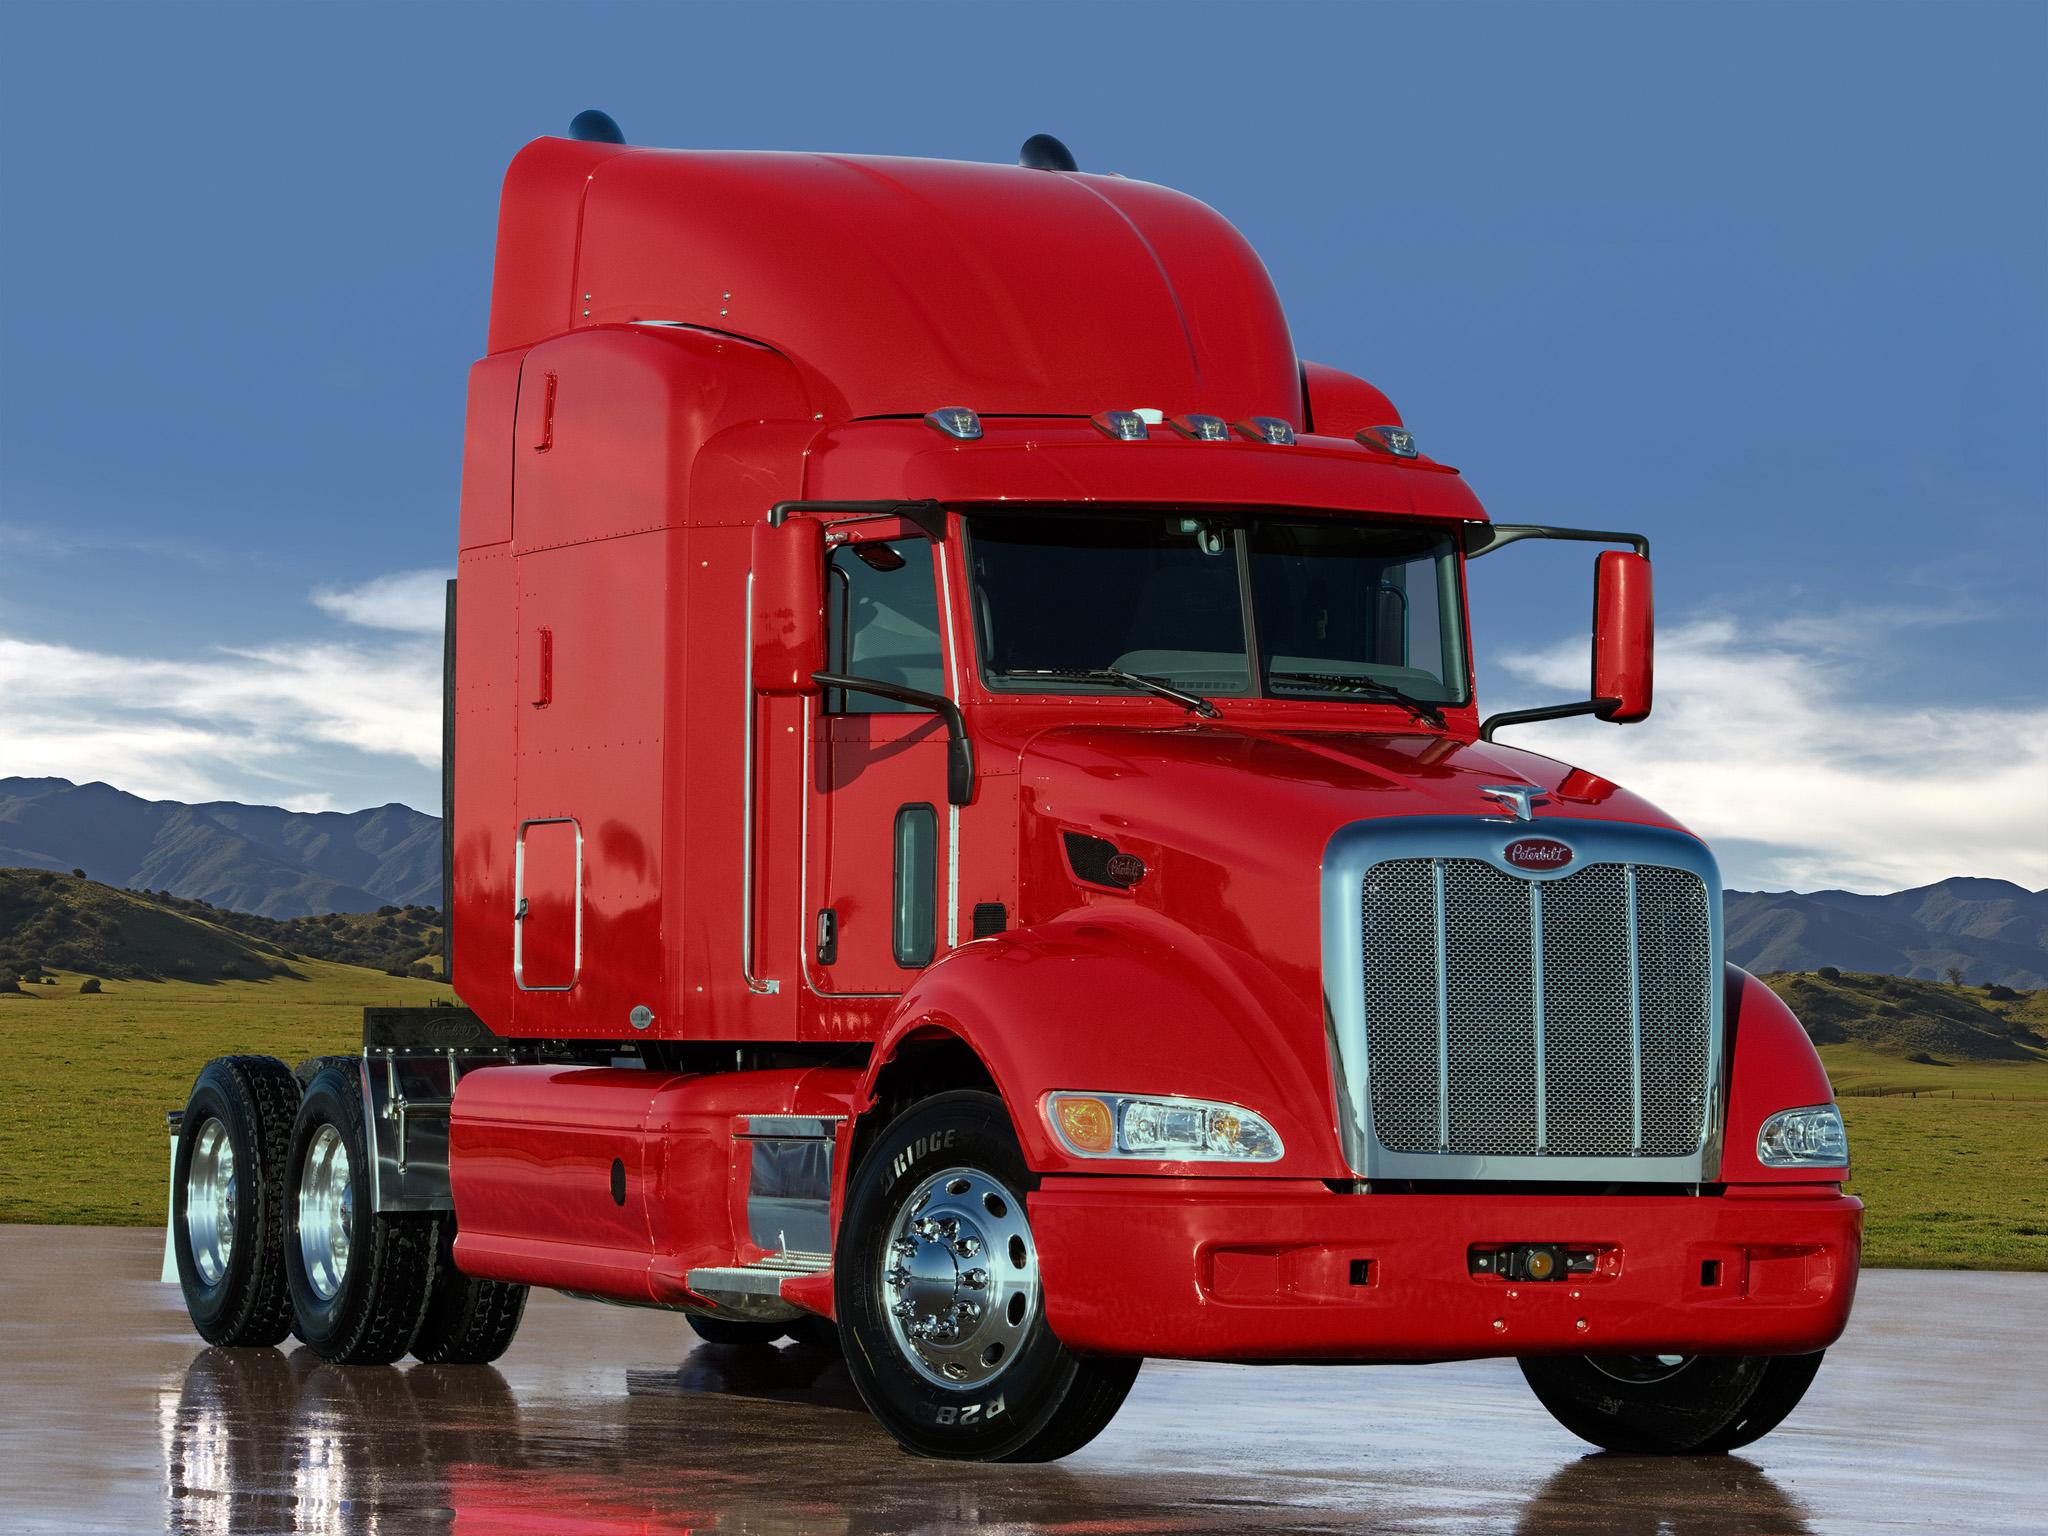 2005 Peterbilt 386 tractor semi truck transport rig rigs f ...